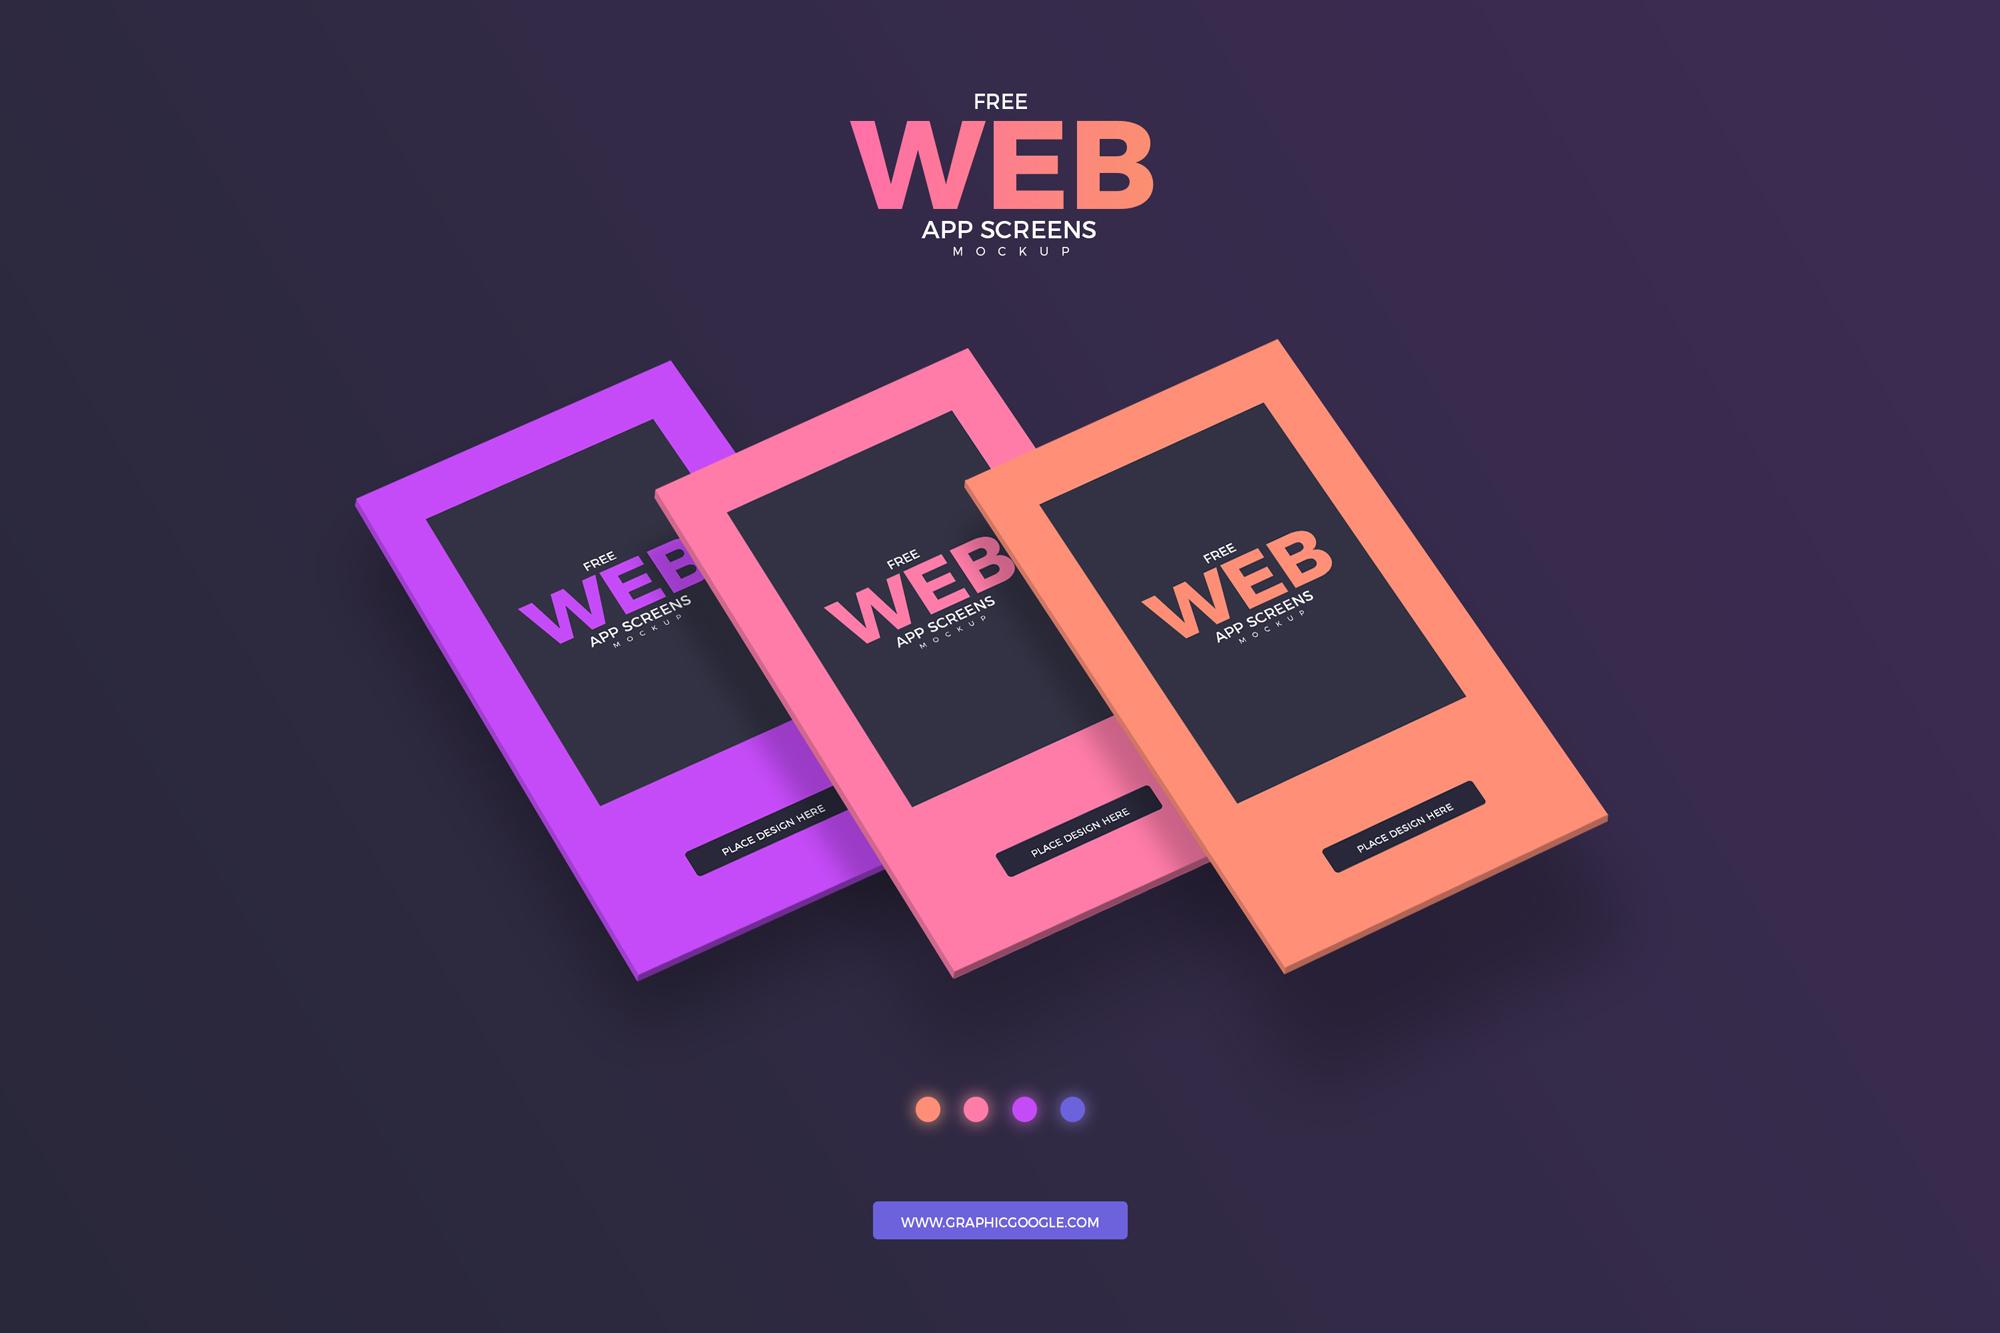 Free Web App Screens Mockup